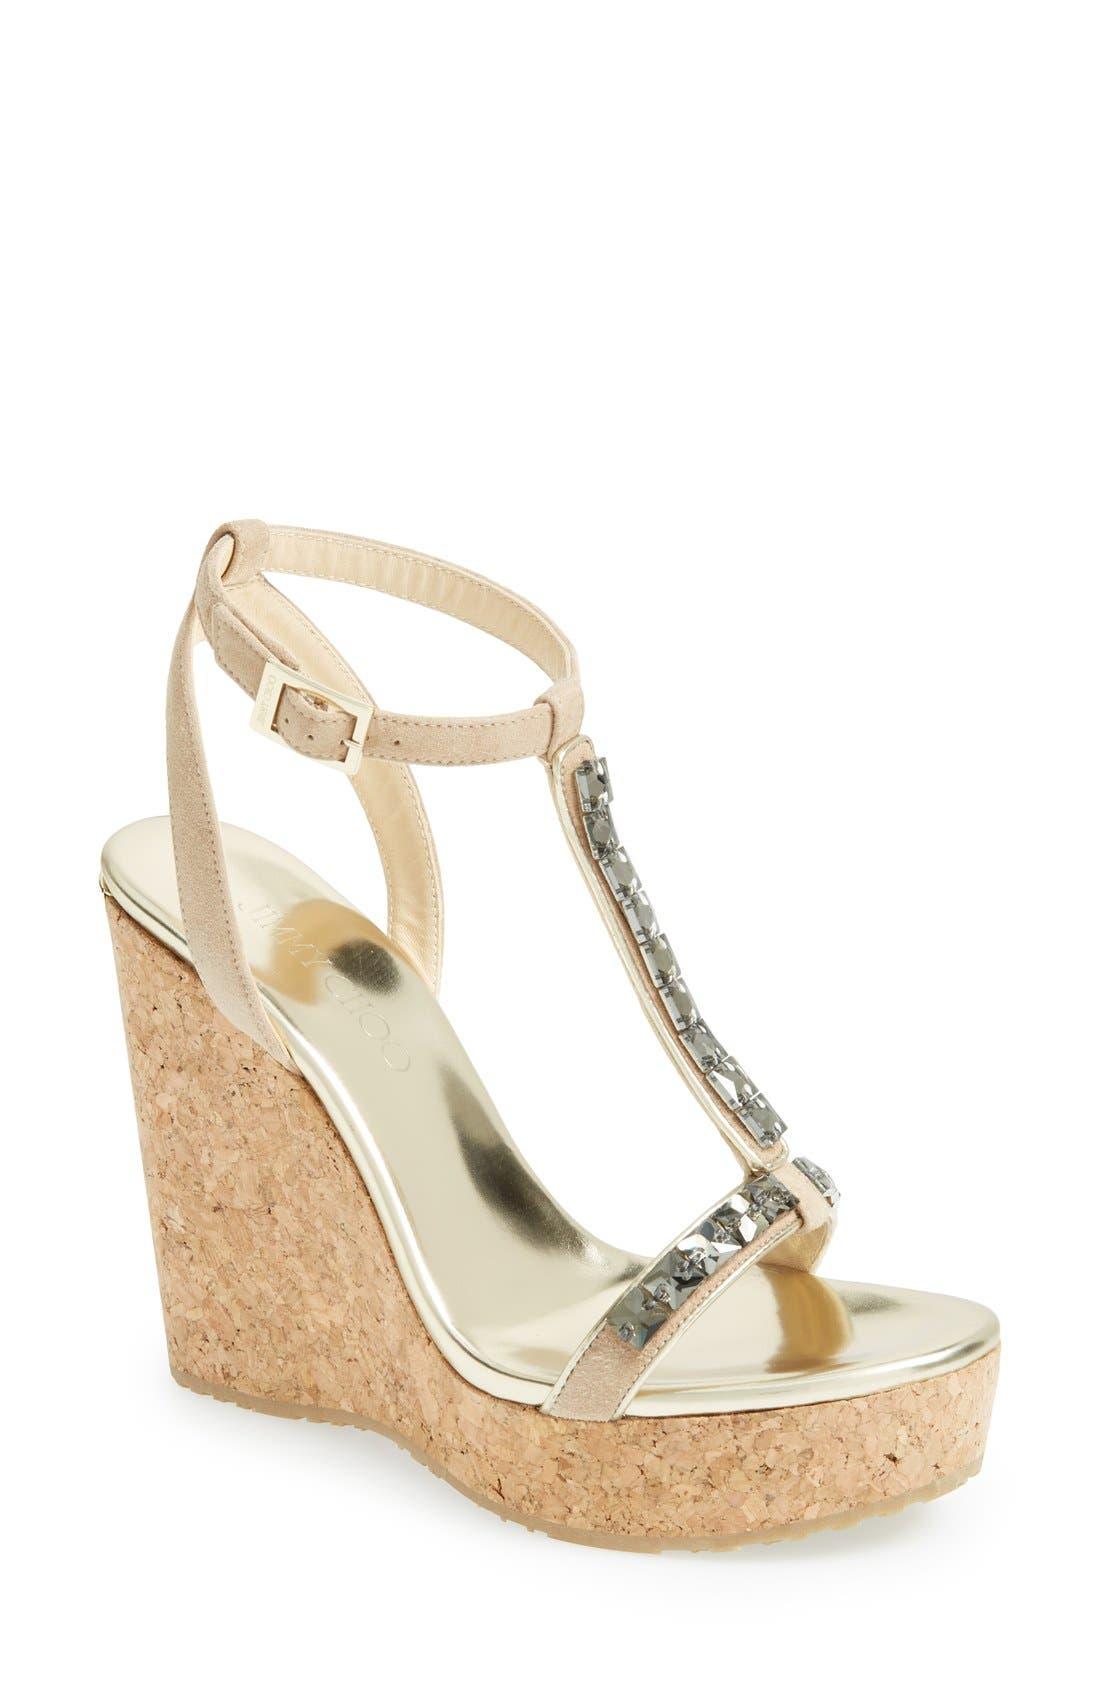 Main Image - Jimmy Choo 'Naima' Jeweled T-Strap Wedge Sandal (Women)